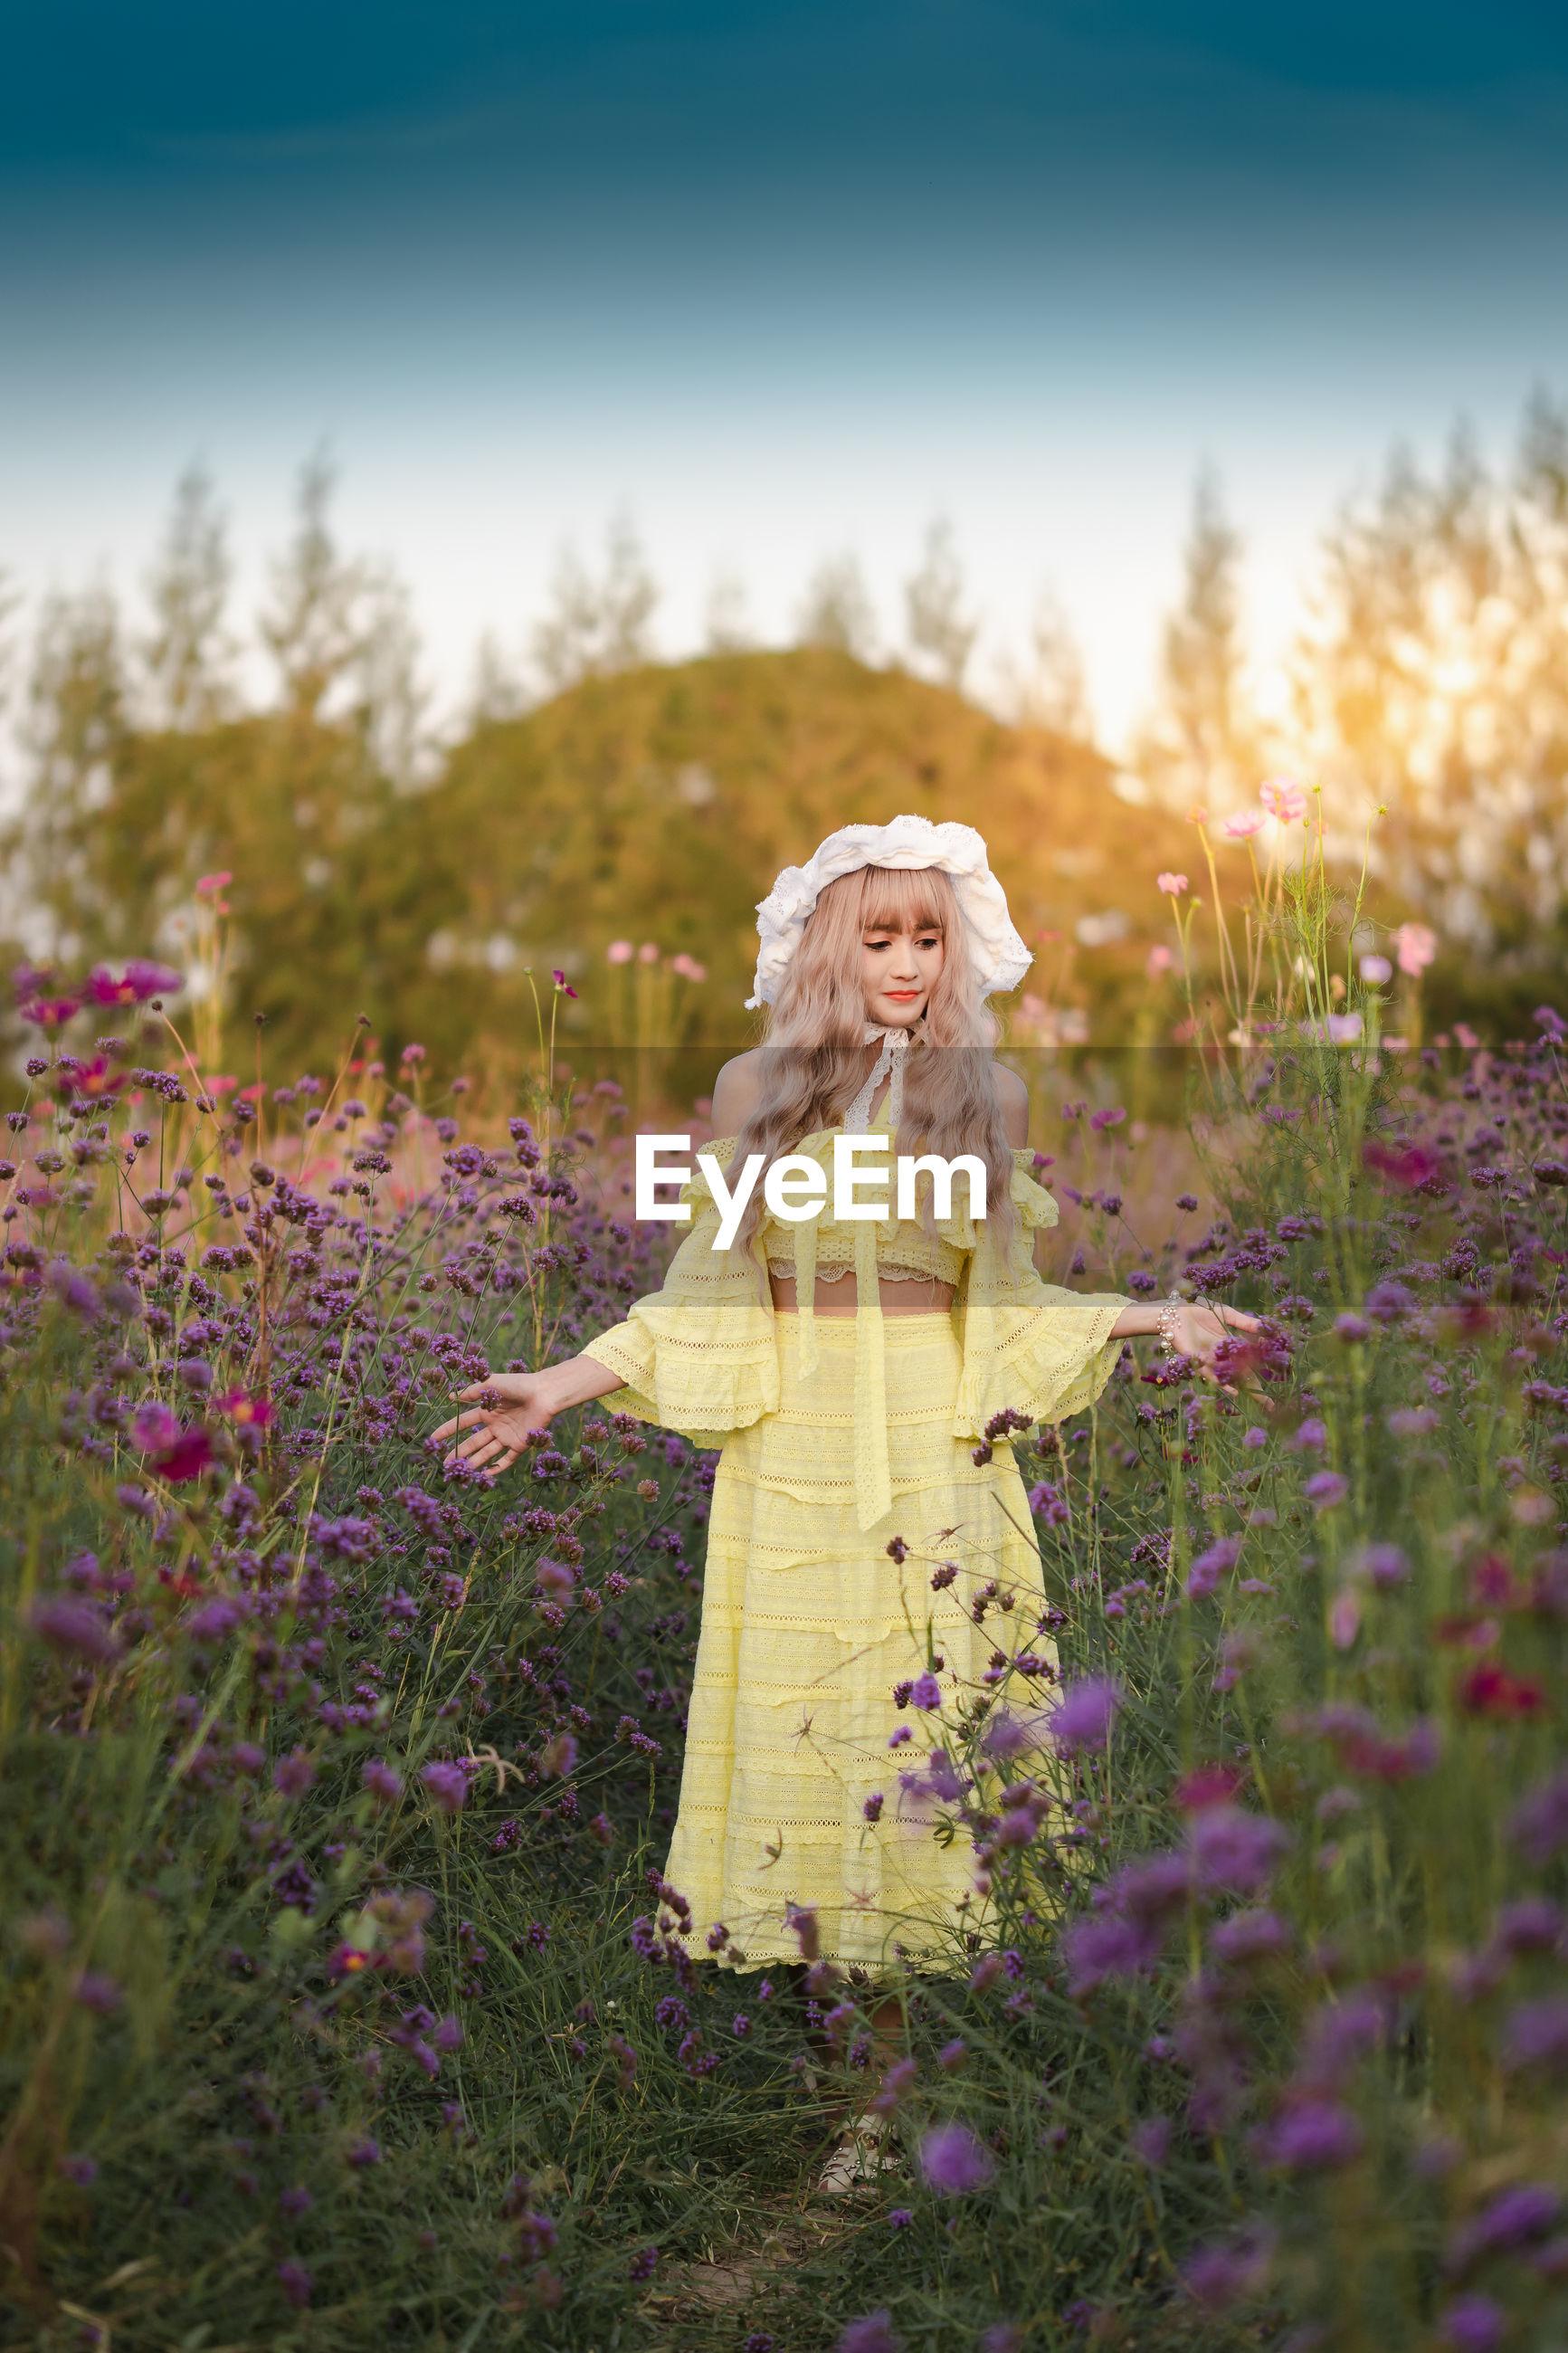 WOMAN STANDING ON PURPLE FLOWERING PLANT ON FIELD